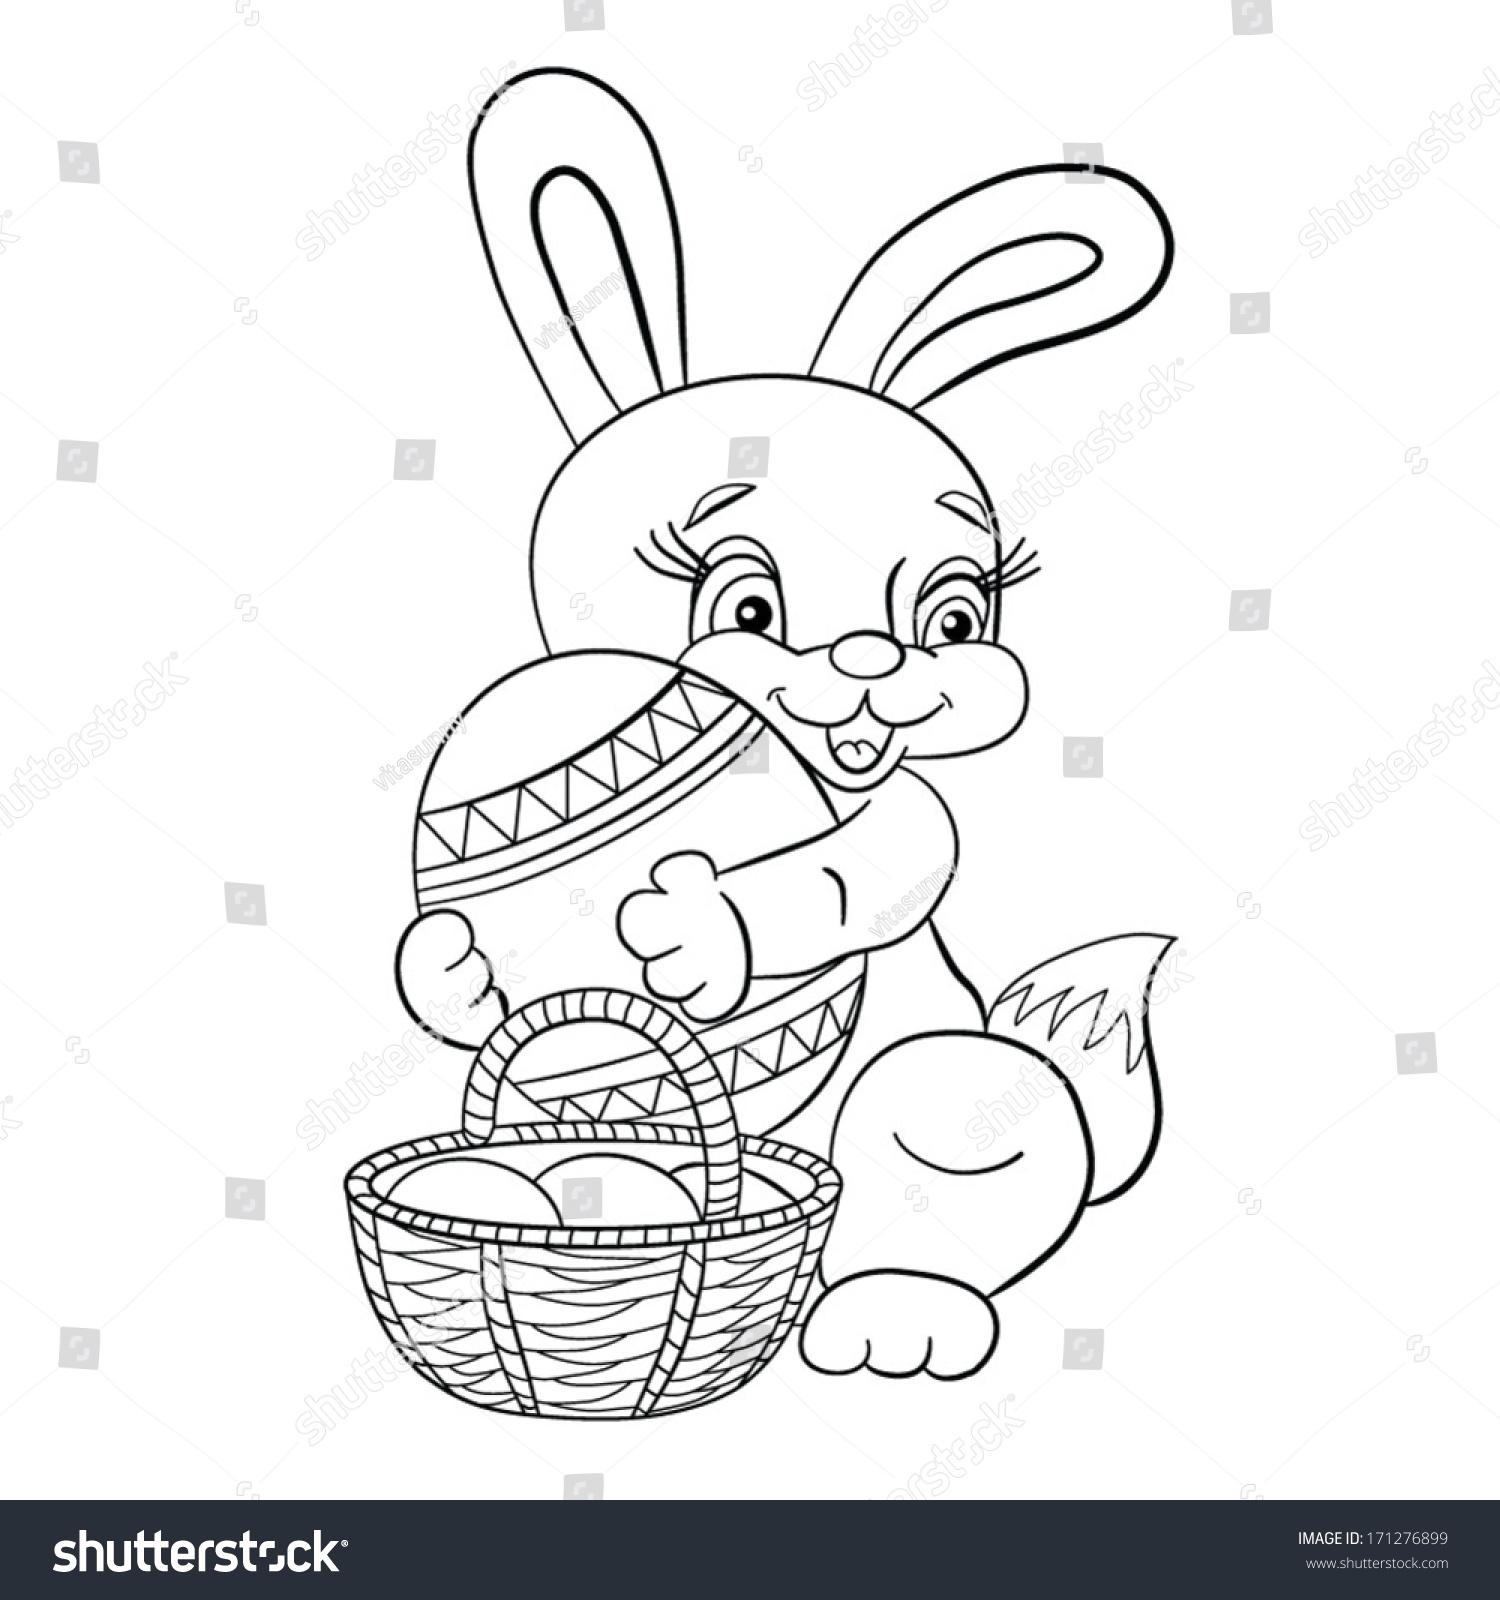 Contour Blackwhite Cartoon Merry Little Easter Stock Vector (Royalty ...